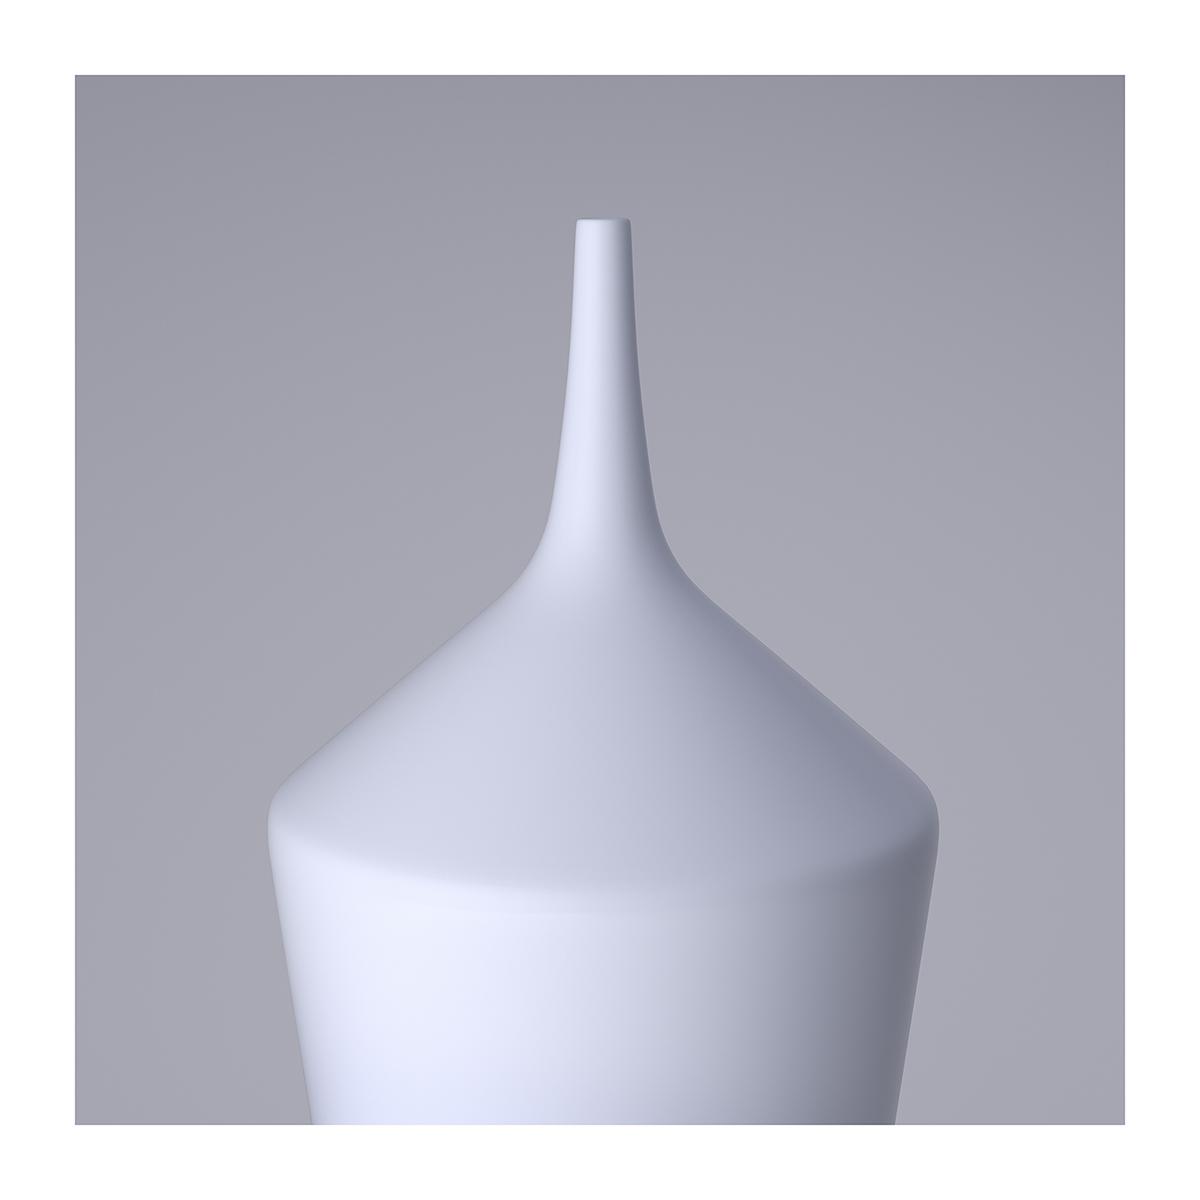 235 Lsdr TWHS Virtual Ceramics II 004 - 2021 - La simplicité du regard. This was HomoSapiens. Virtual Ceramics. II